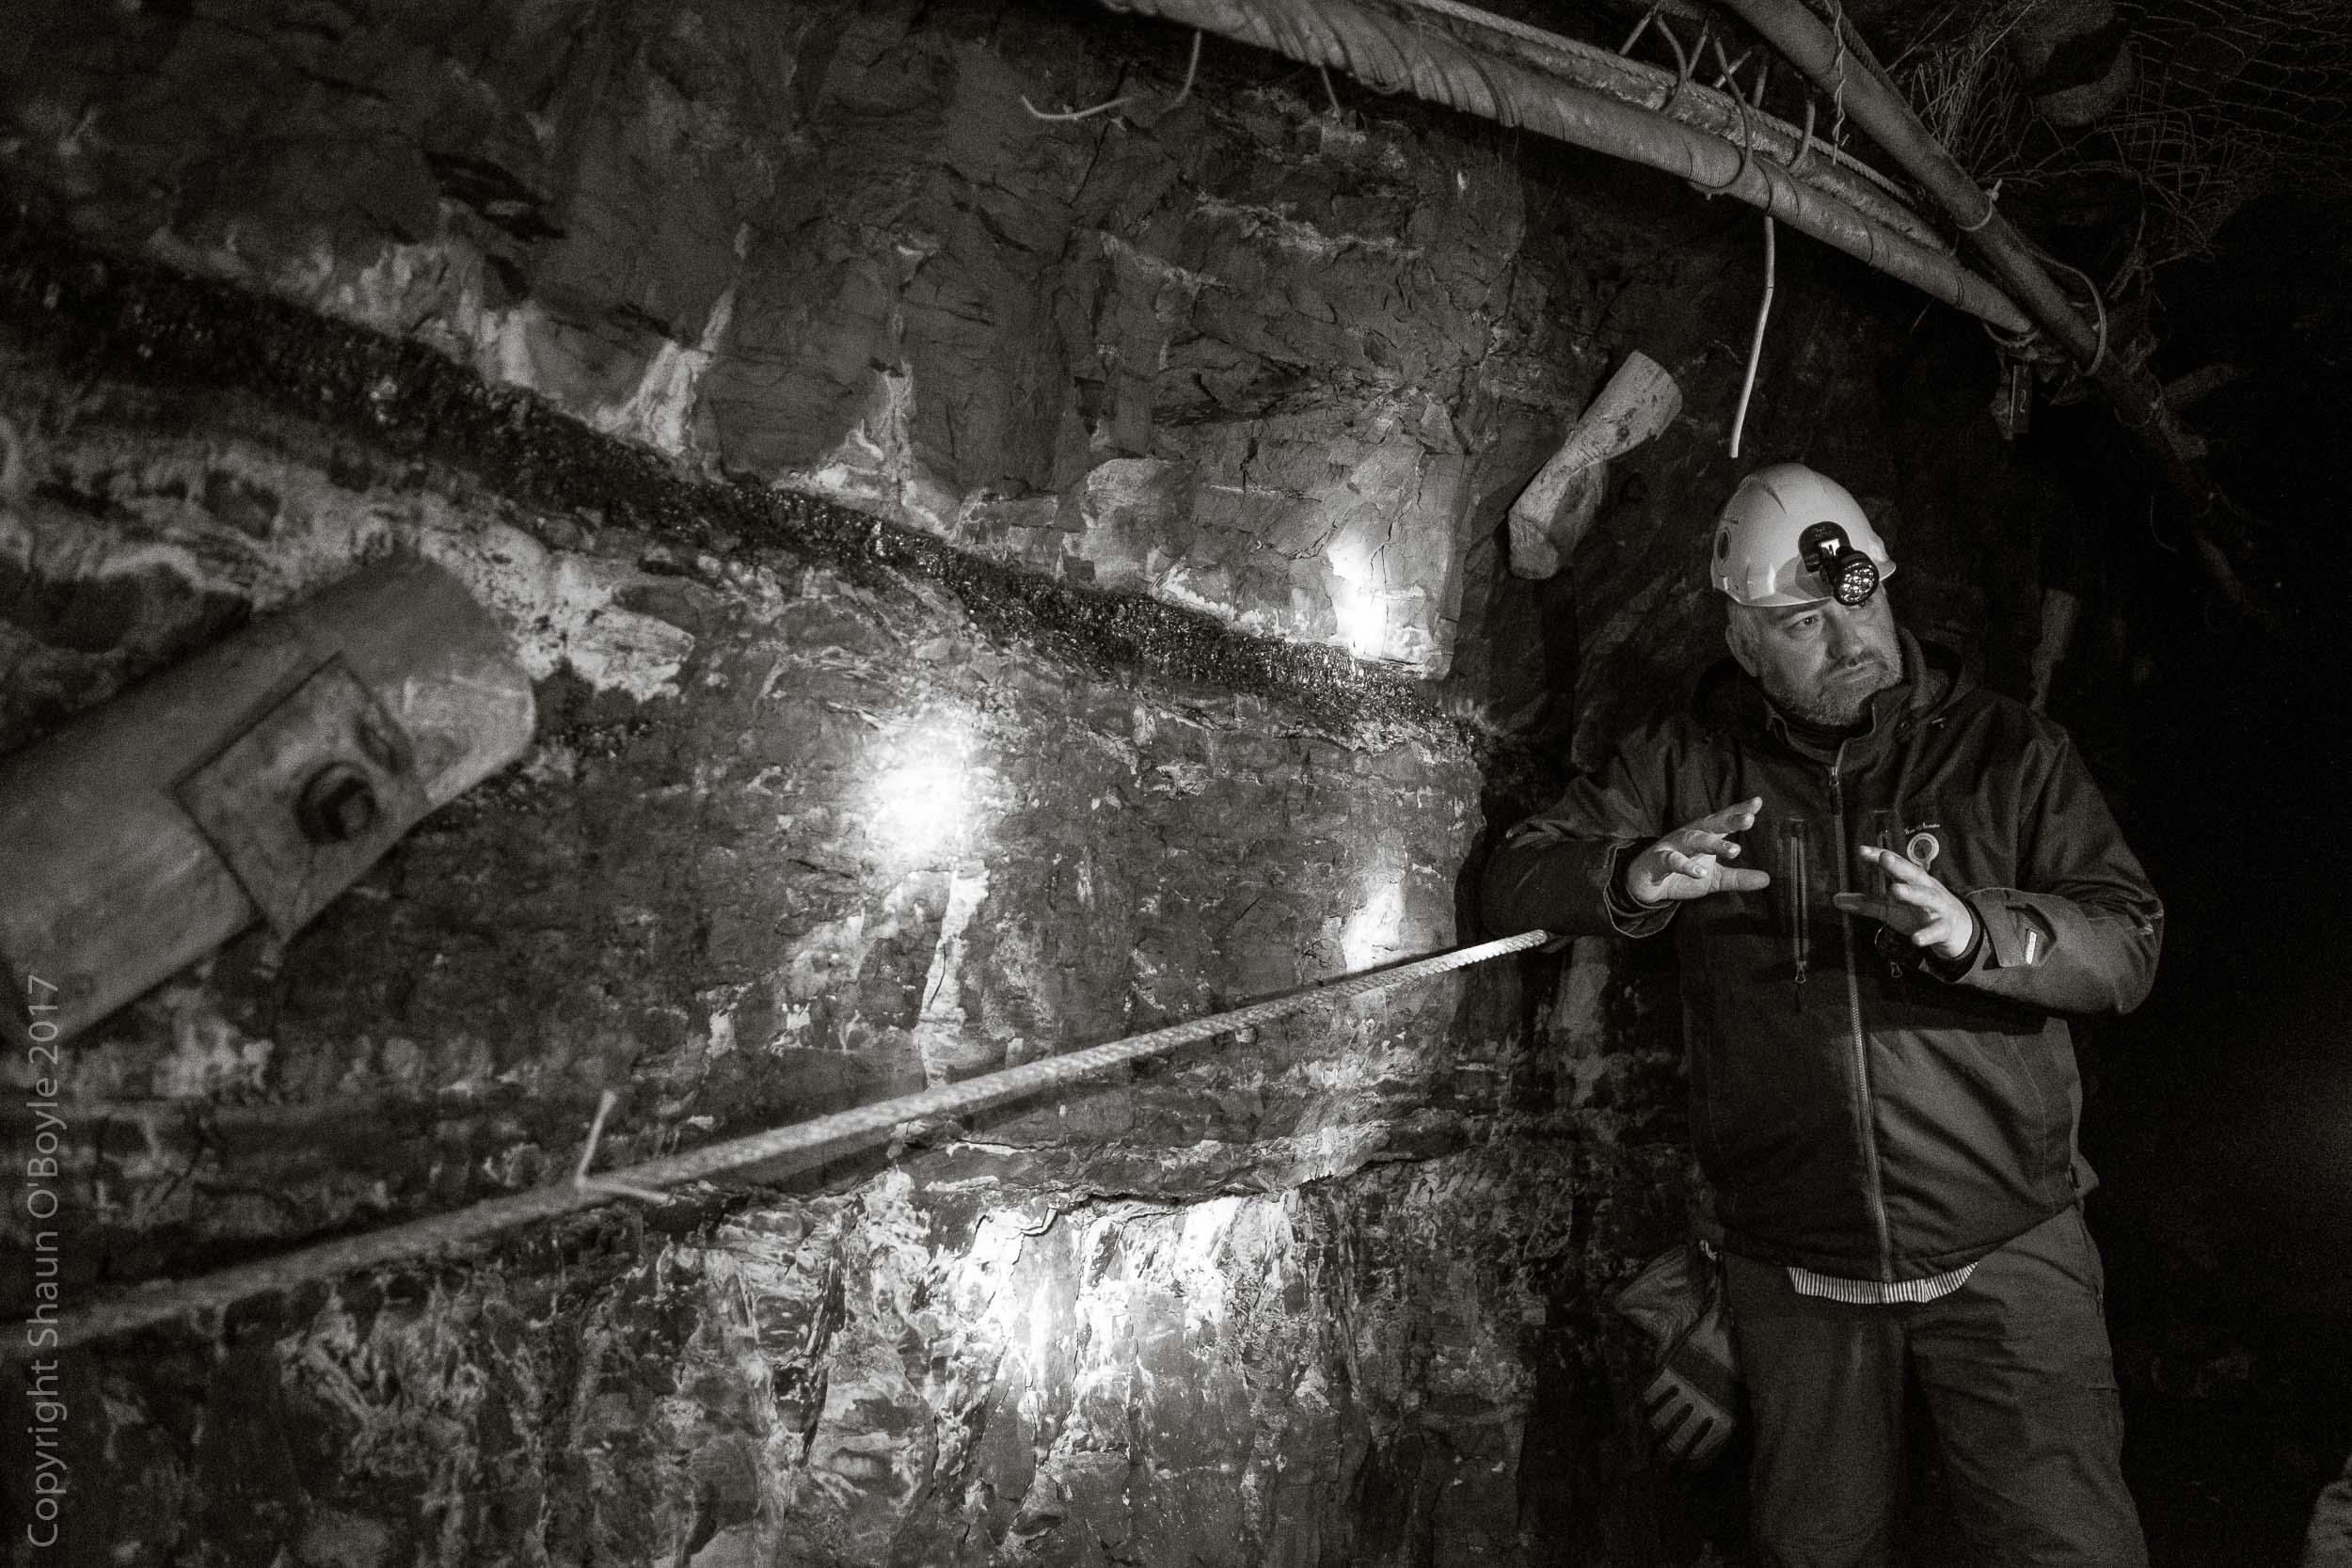 Mine #3 and thin coal seam